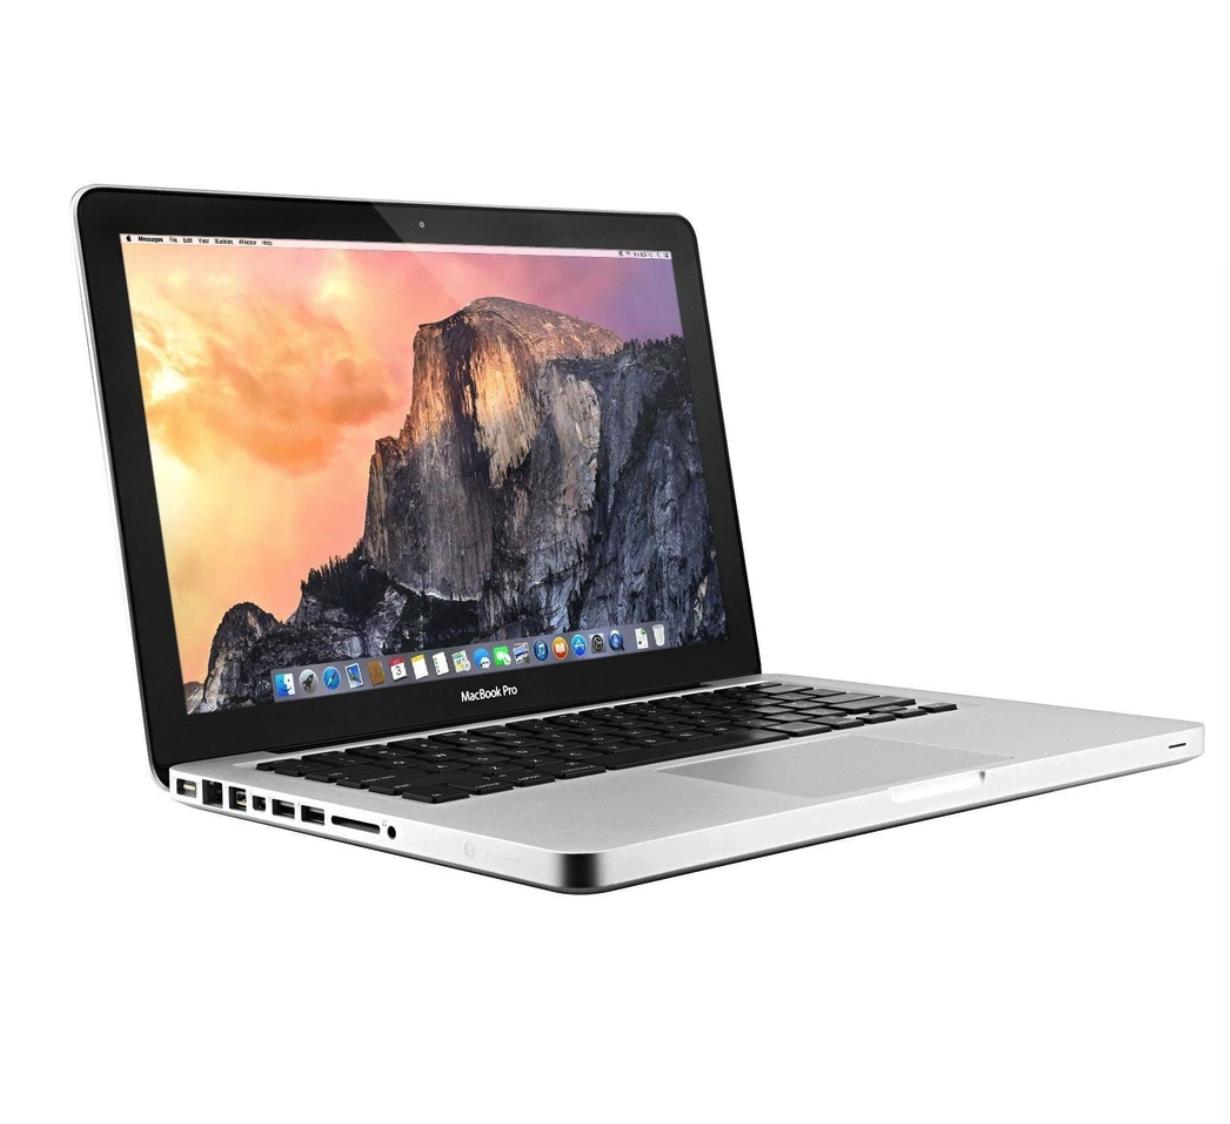 "Apple MacBook Pro 13.3"", Intel Core i5 2.5GHz, 500GB Hard Drive, DVD SuperDrive, 4GB RAM"